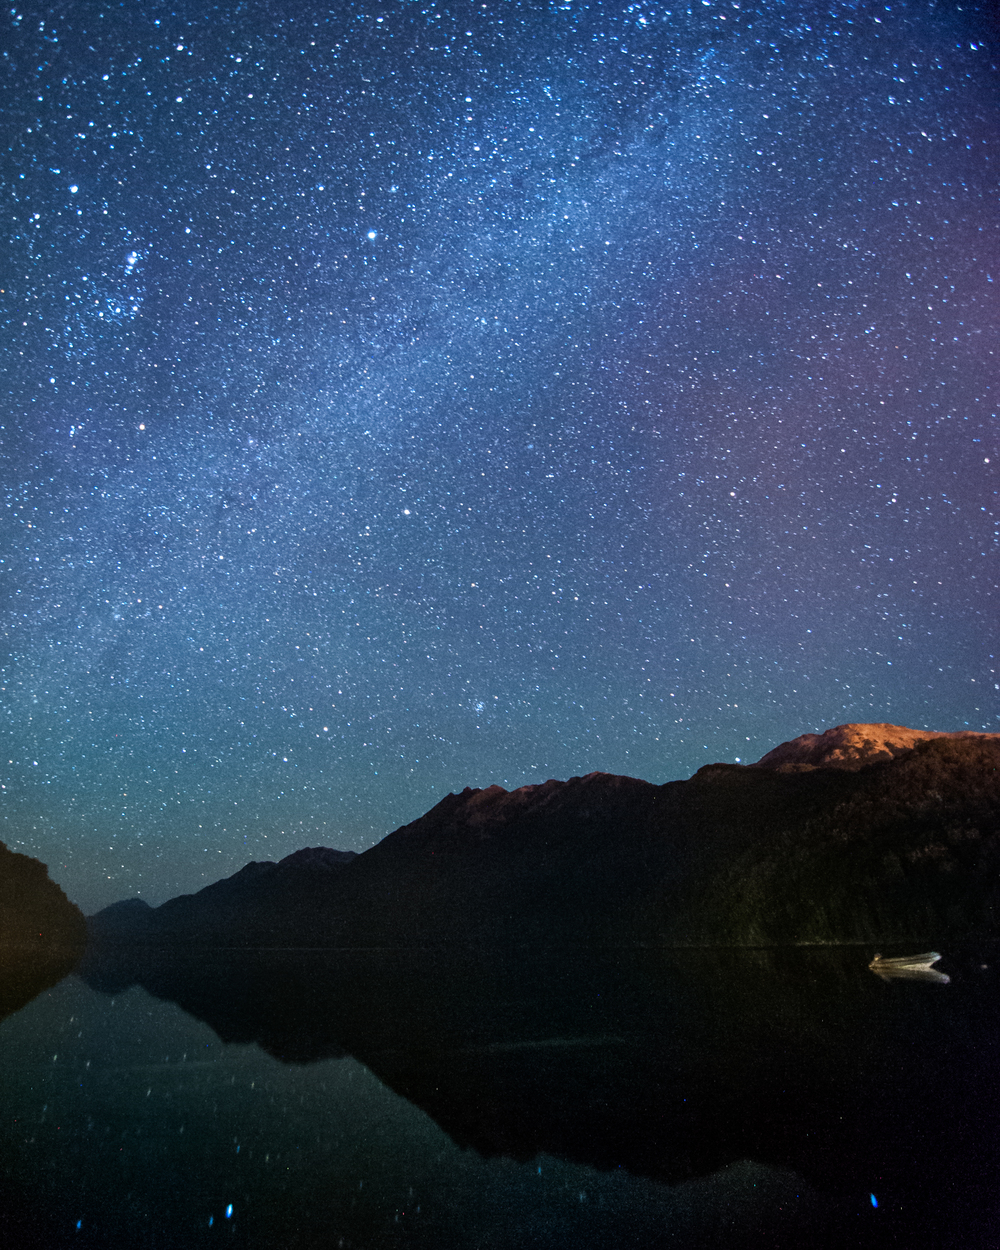 The Milky way - Villa la Angostura, Argentina.